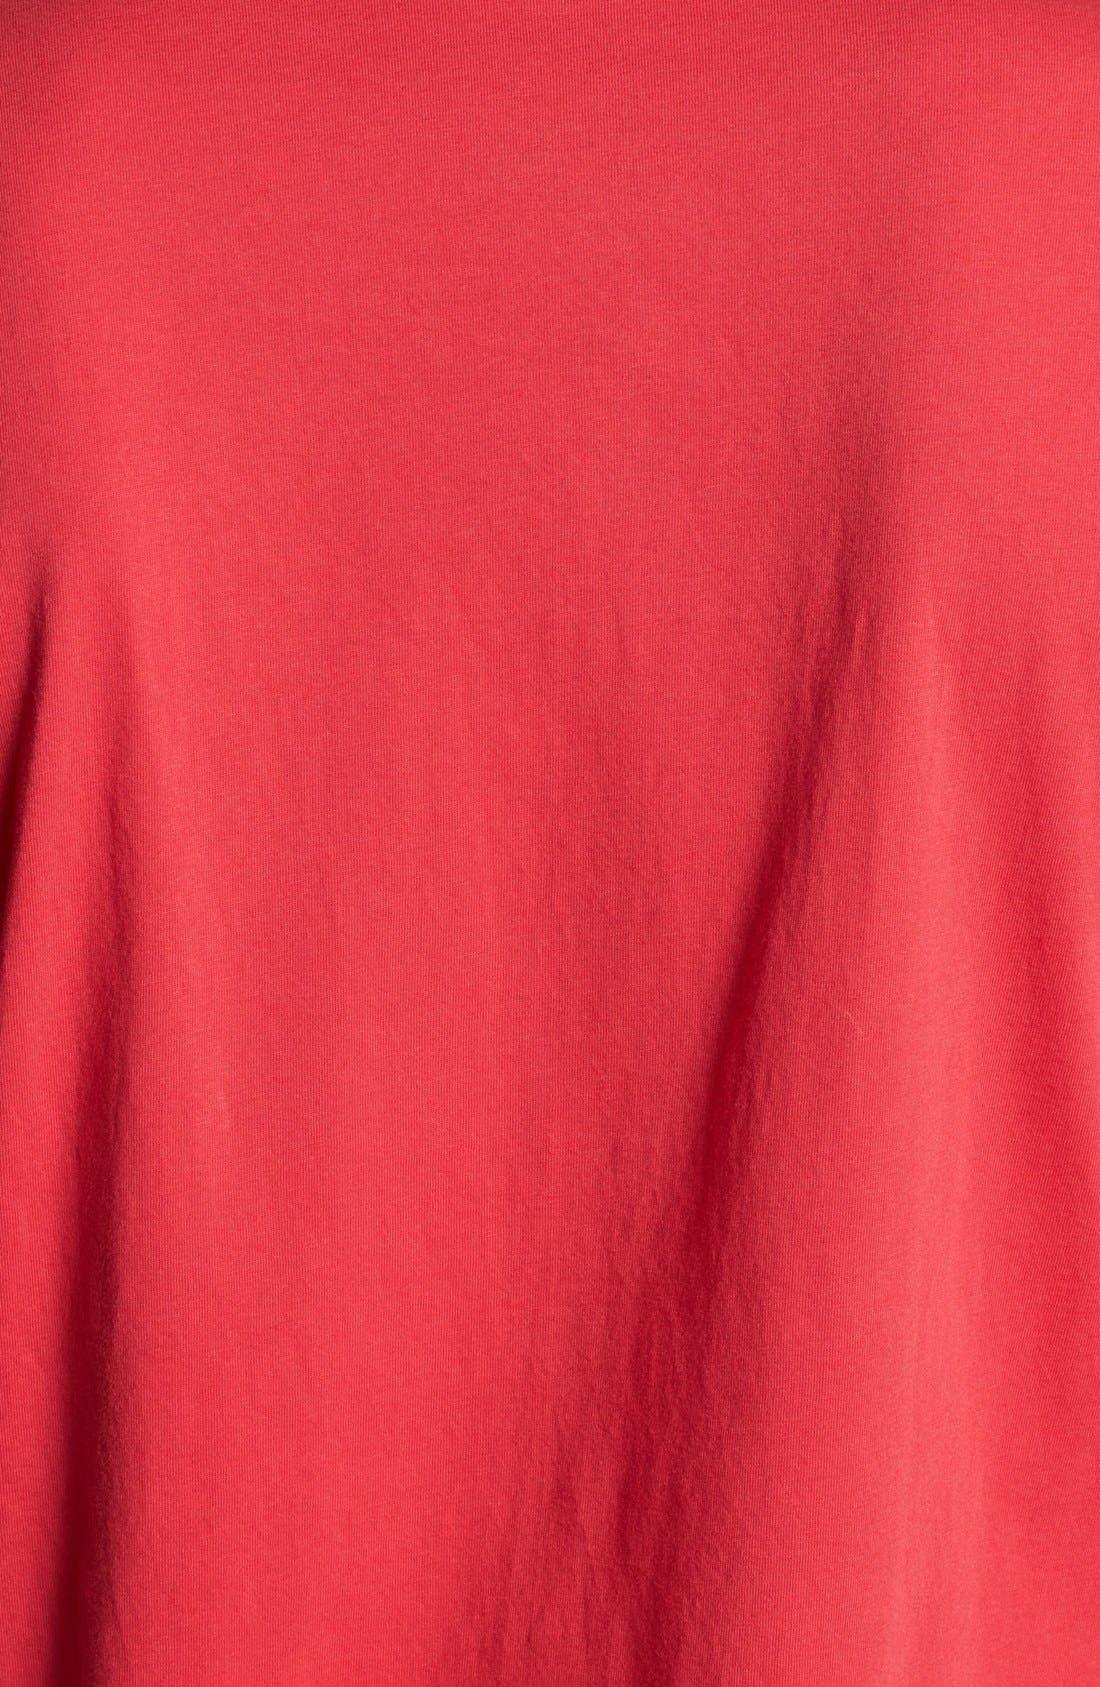 Alternate Image 3  - Junk Food 'Budweiser Hero' T-Shirt